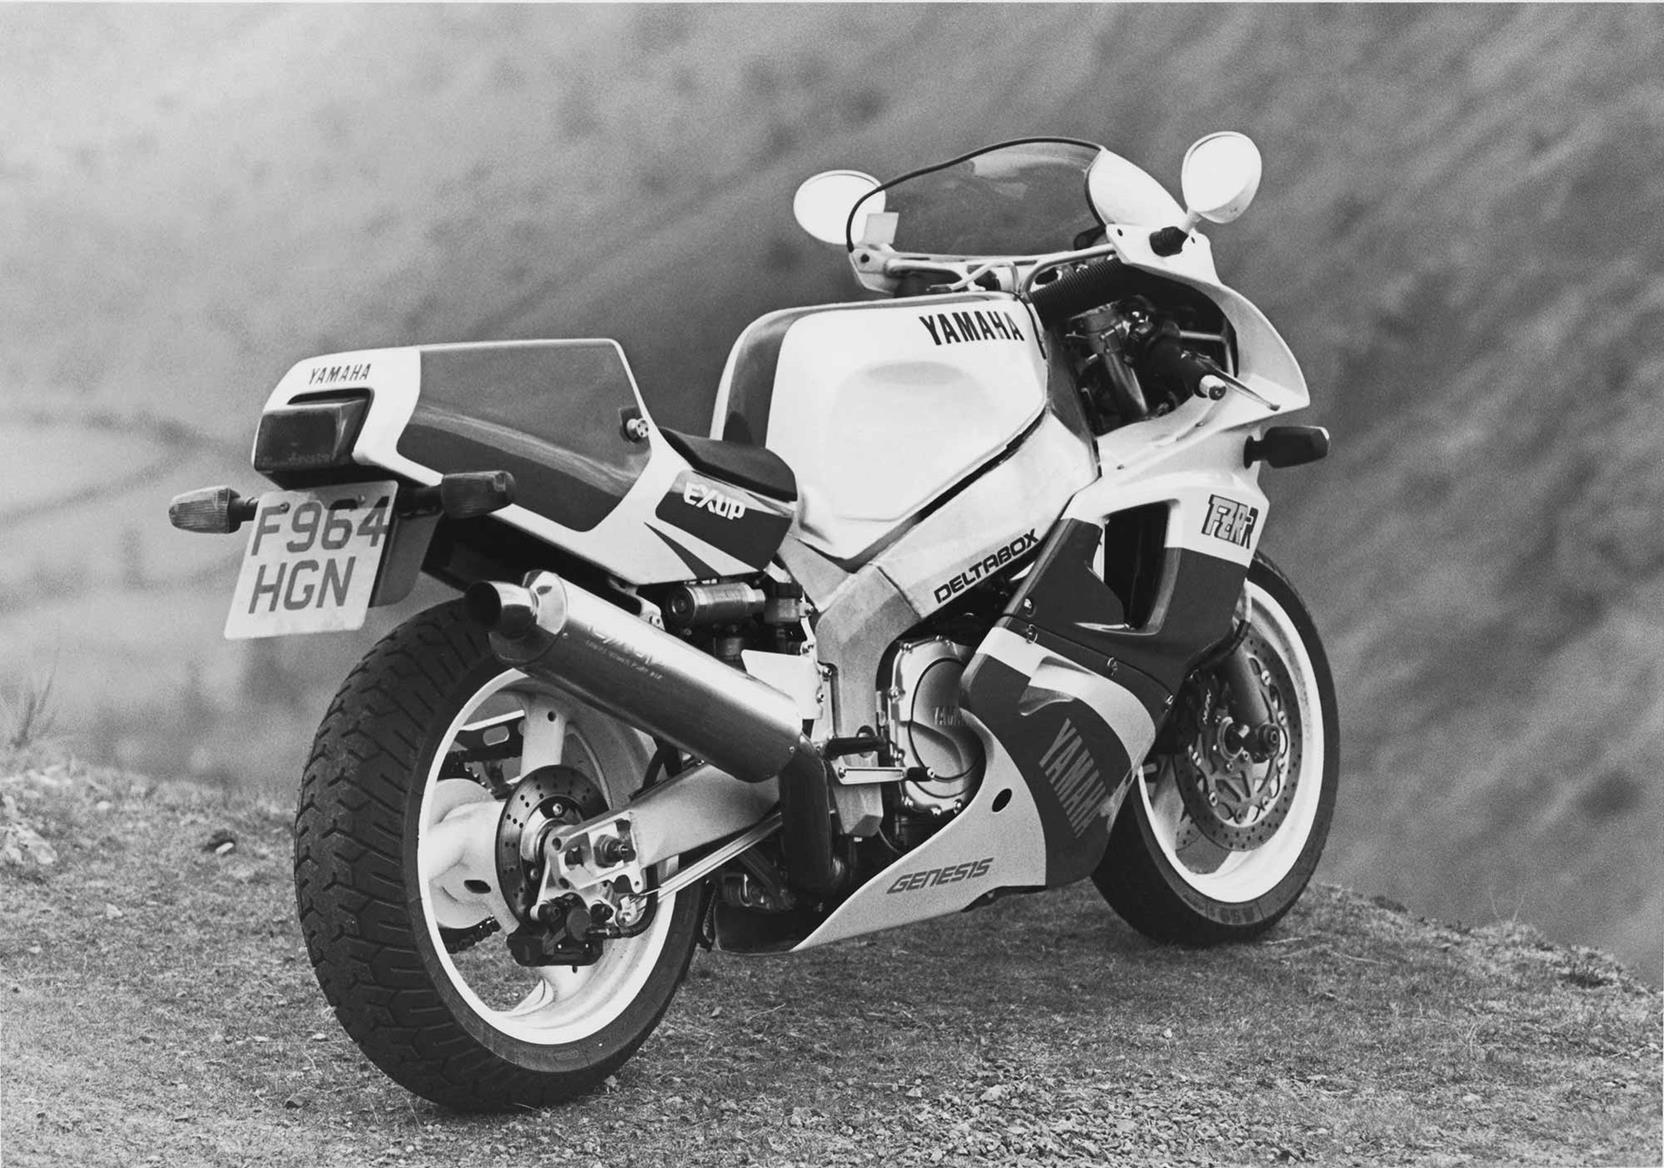 Static on the Yamaha OW-01